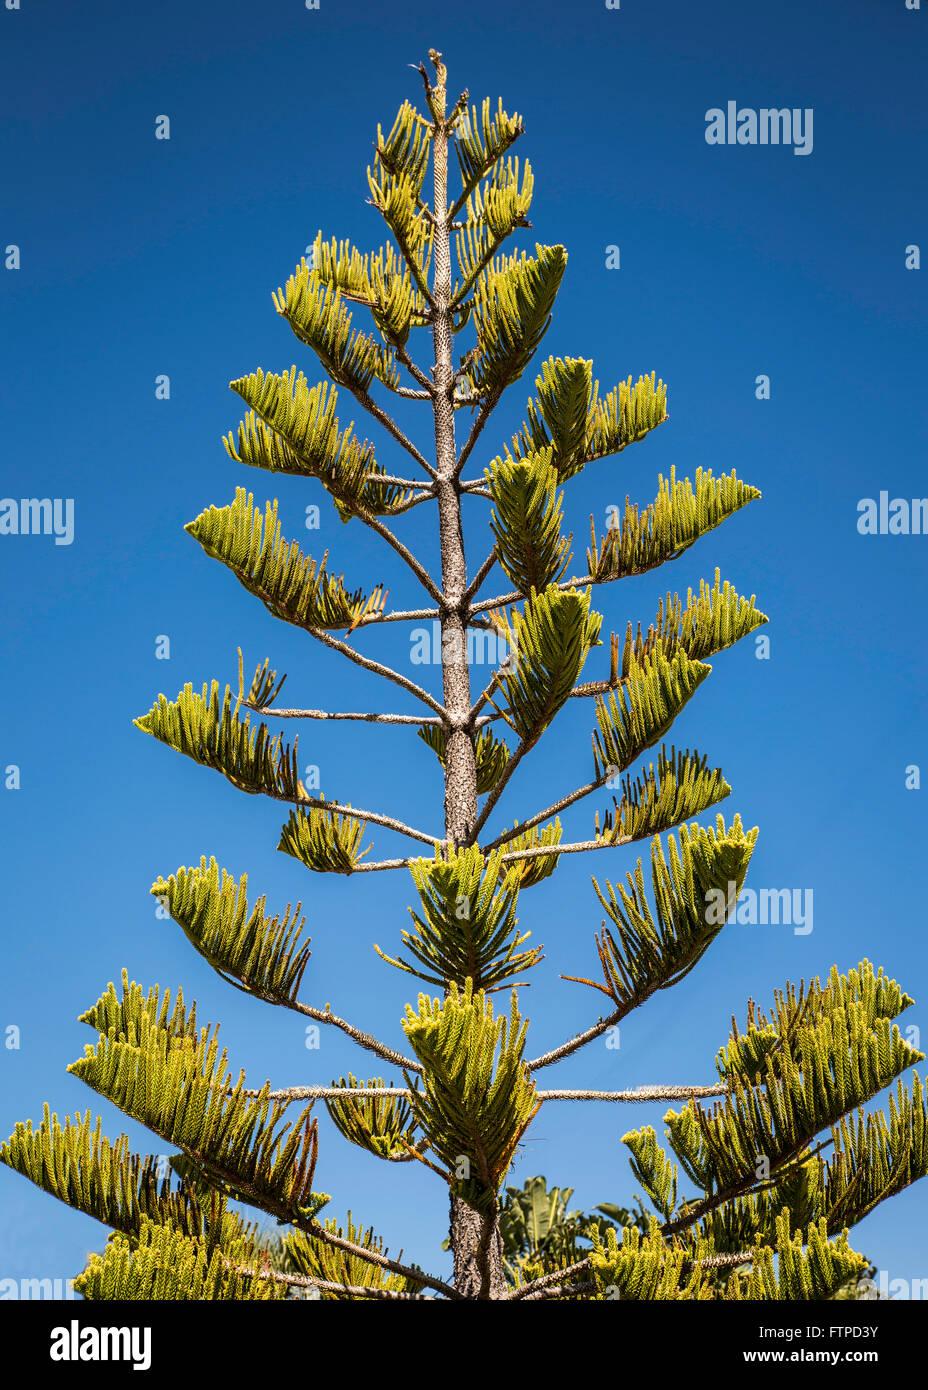 Tall Norfolk Pine Tree growing in Florida Stock Photo: 101296831 - Alamy